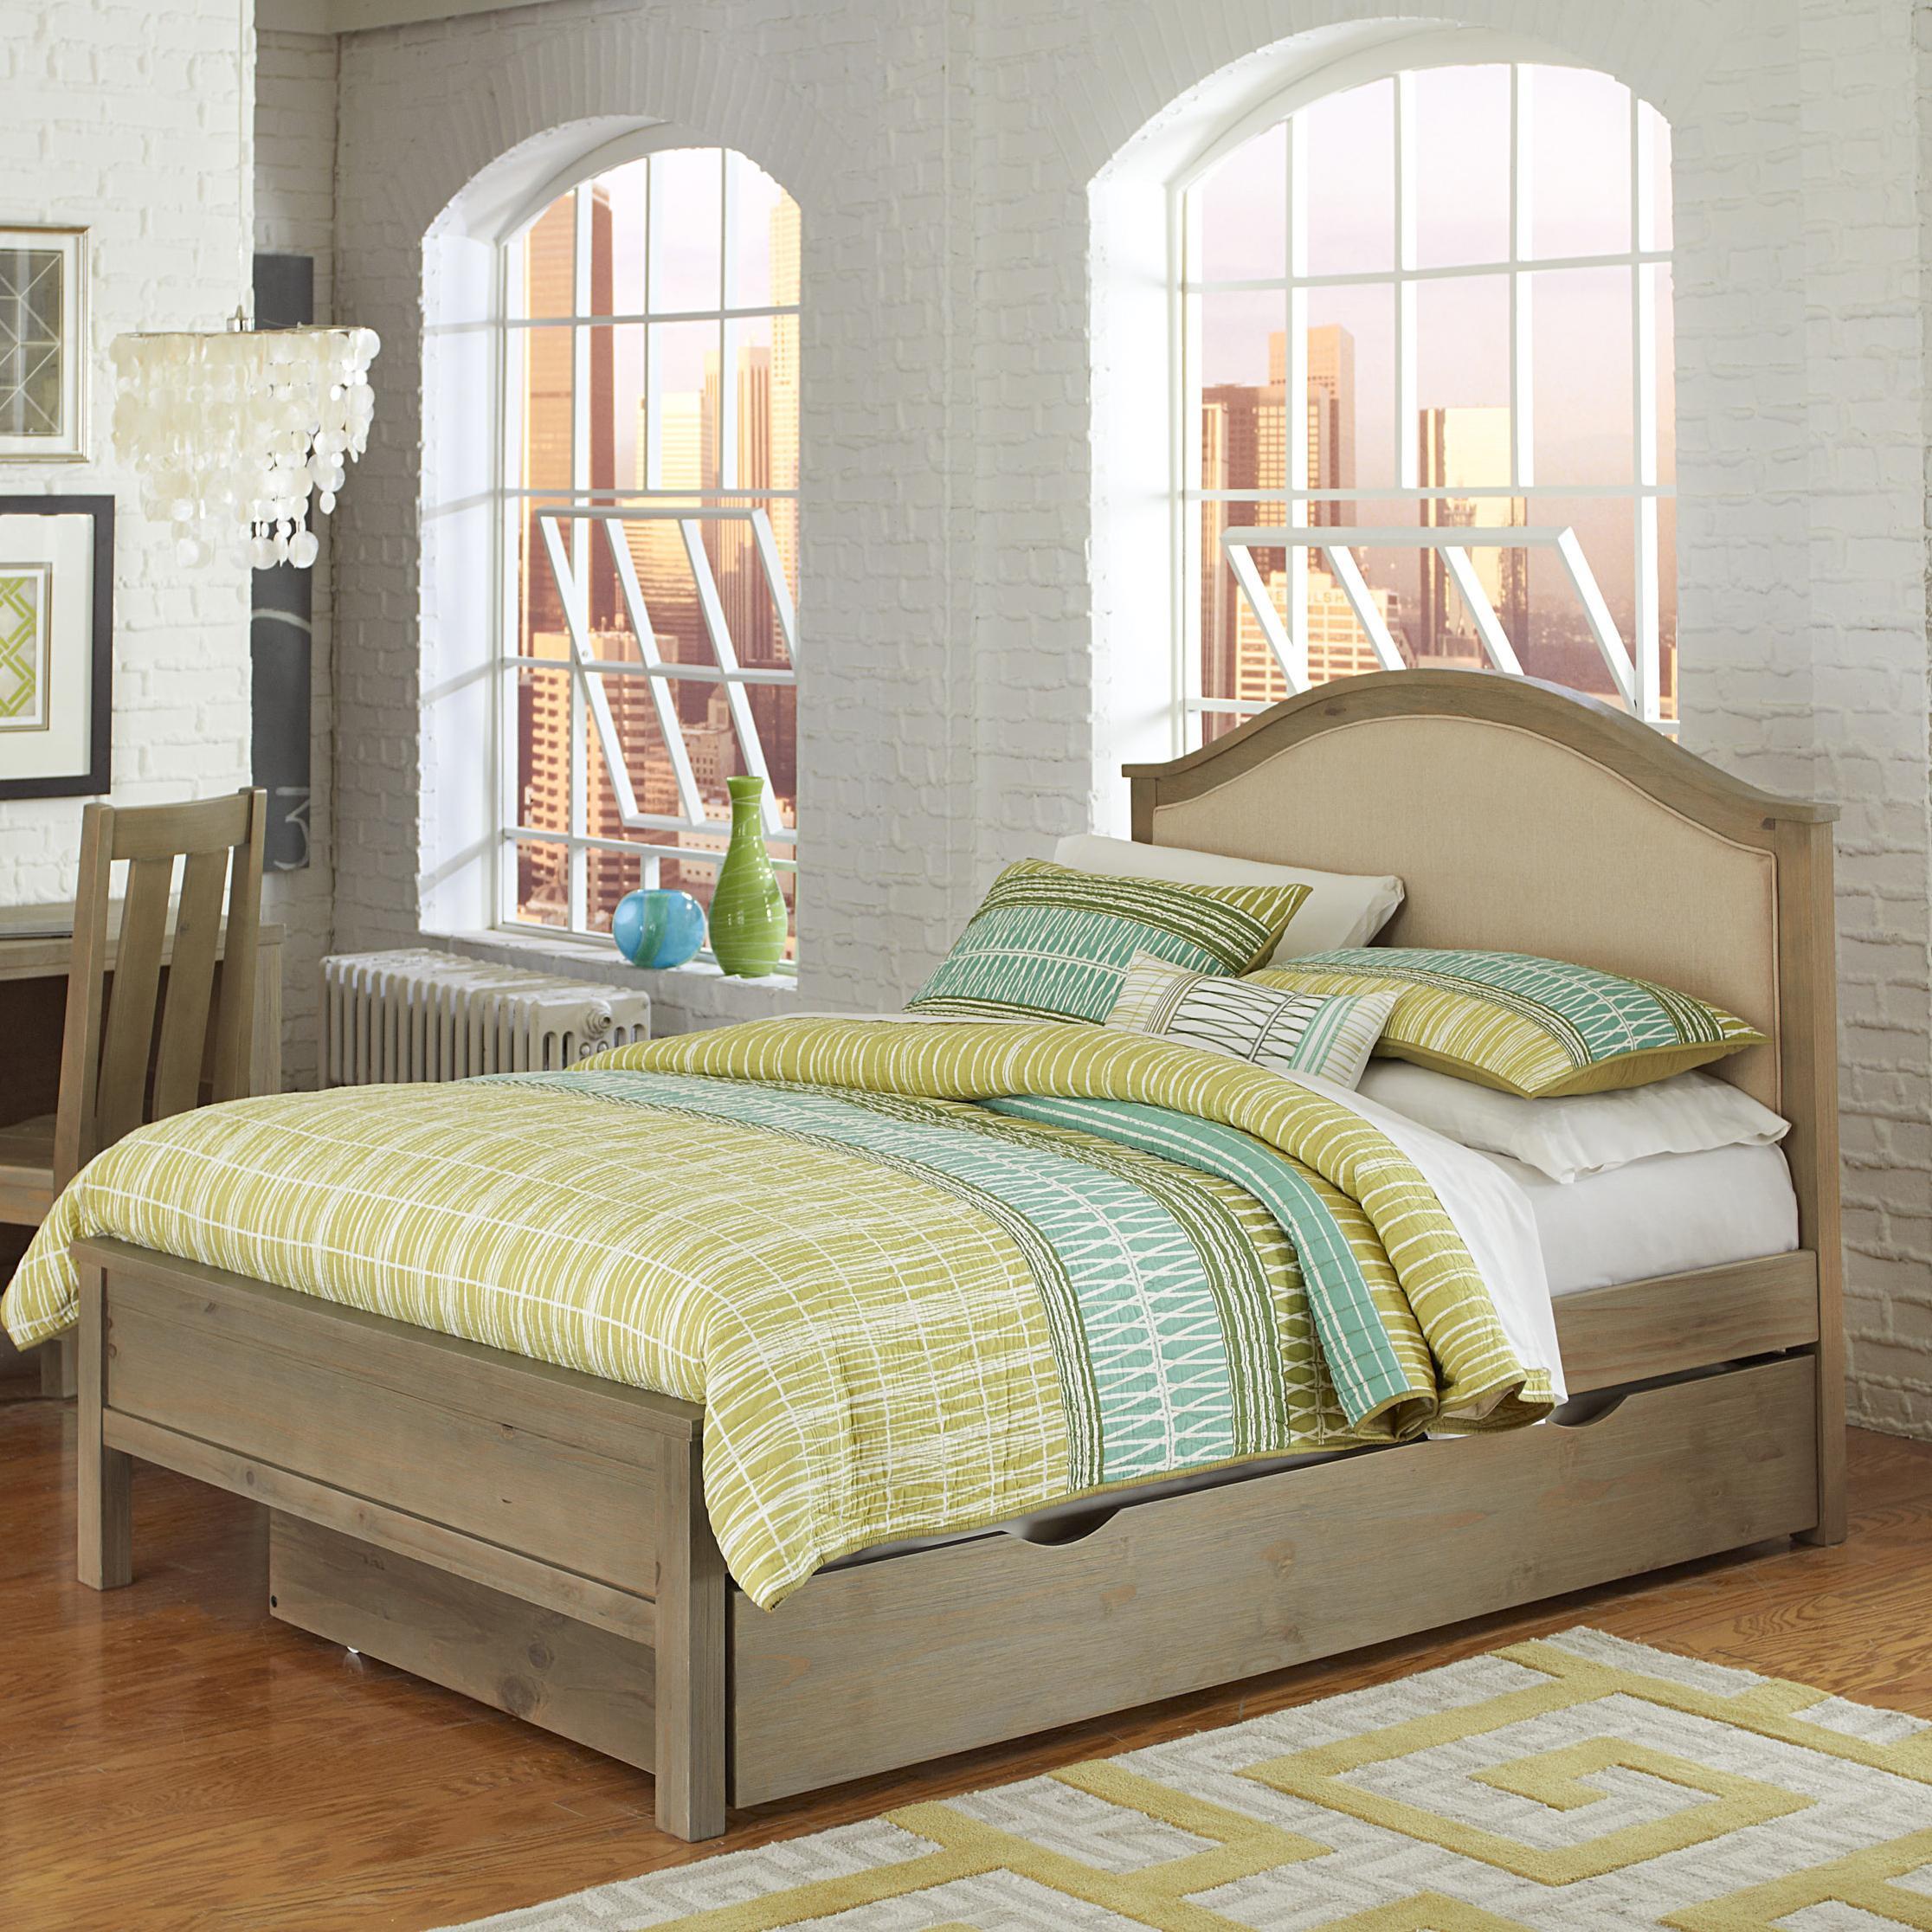 NE Kids Highlands Full Bailey Upholstered Bed with Trundle - Item Number: 10015+10560